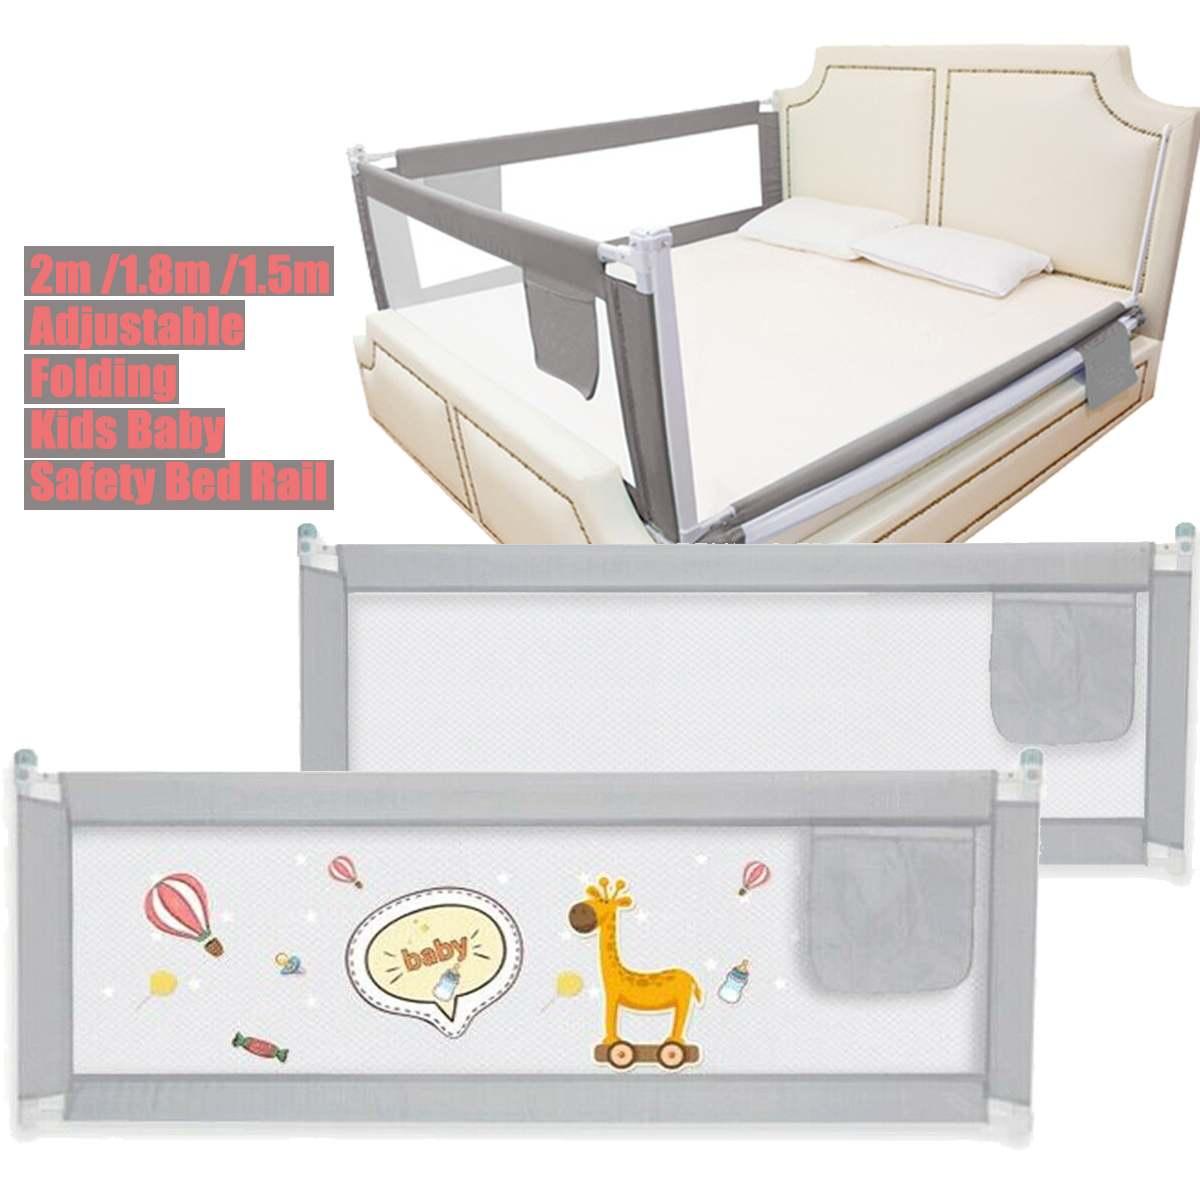 Adjustable Baby Playpen Bed Safety Rails For Babies Children Fences Fence Baby Safety Gate Crib Barrier For Kids Newborn Infants